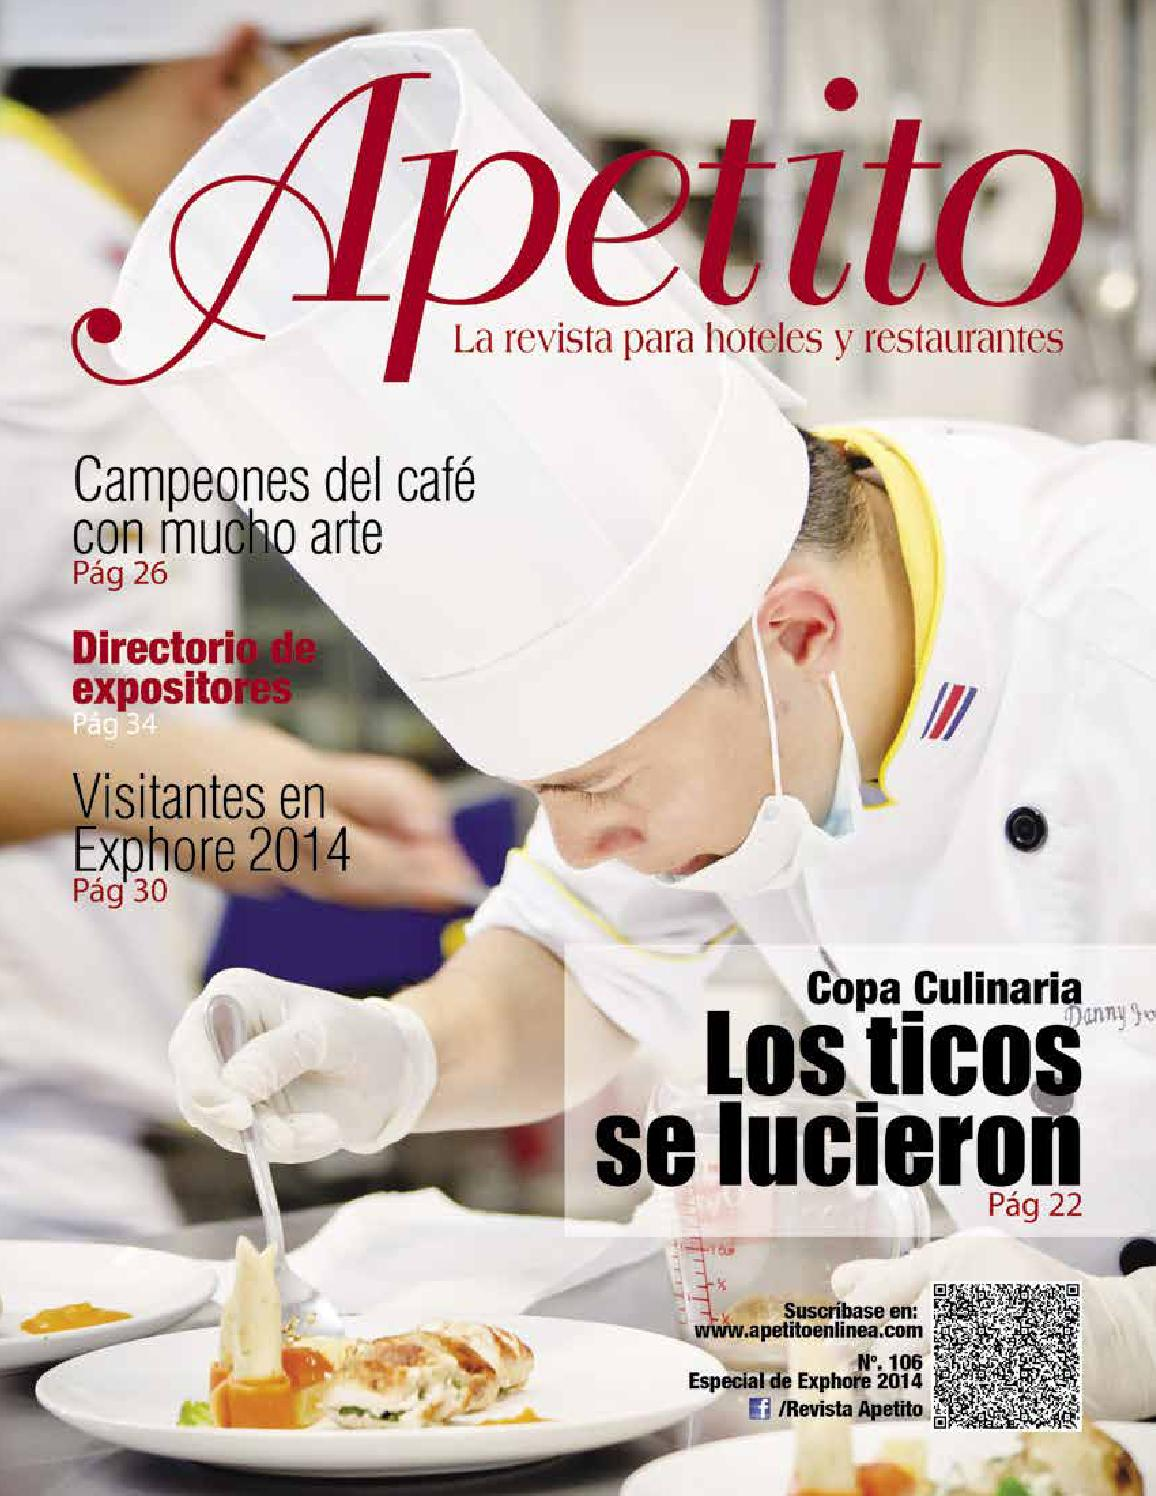 Apetito 106 Especial de Exphore 2014 by EKA Consultores - issuu